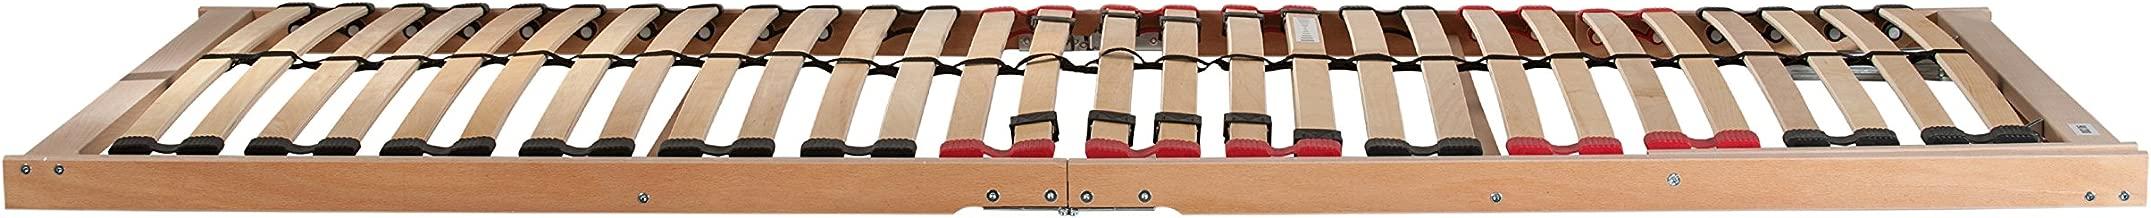 Hansales Rollrost 135x200cm Hochwertiger Extra starker Rollattenrost aus echtem Birkenholz Lattenrollrost Premium FSC Lattenrost unbehandelt 300 kg 25 Leisten